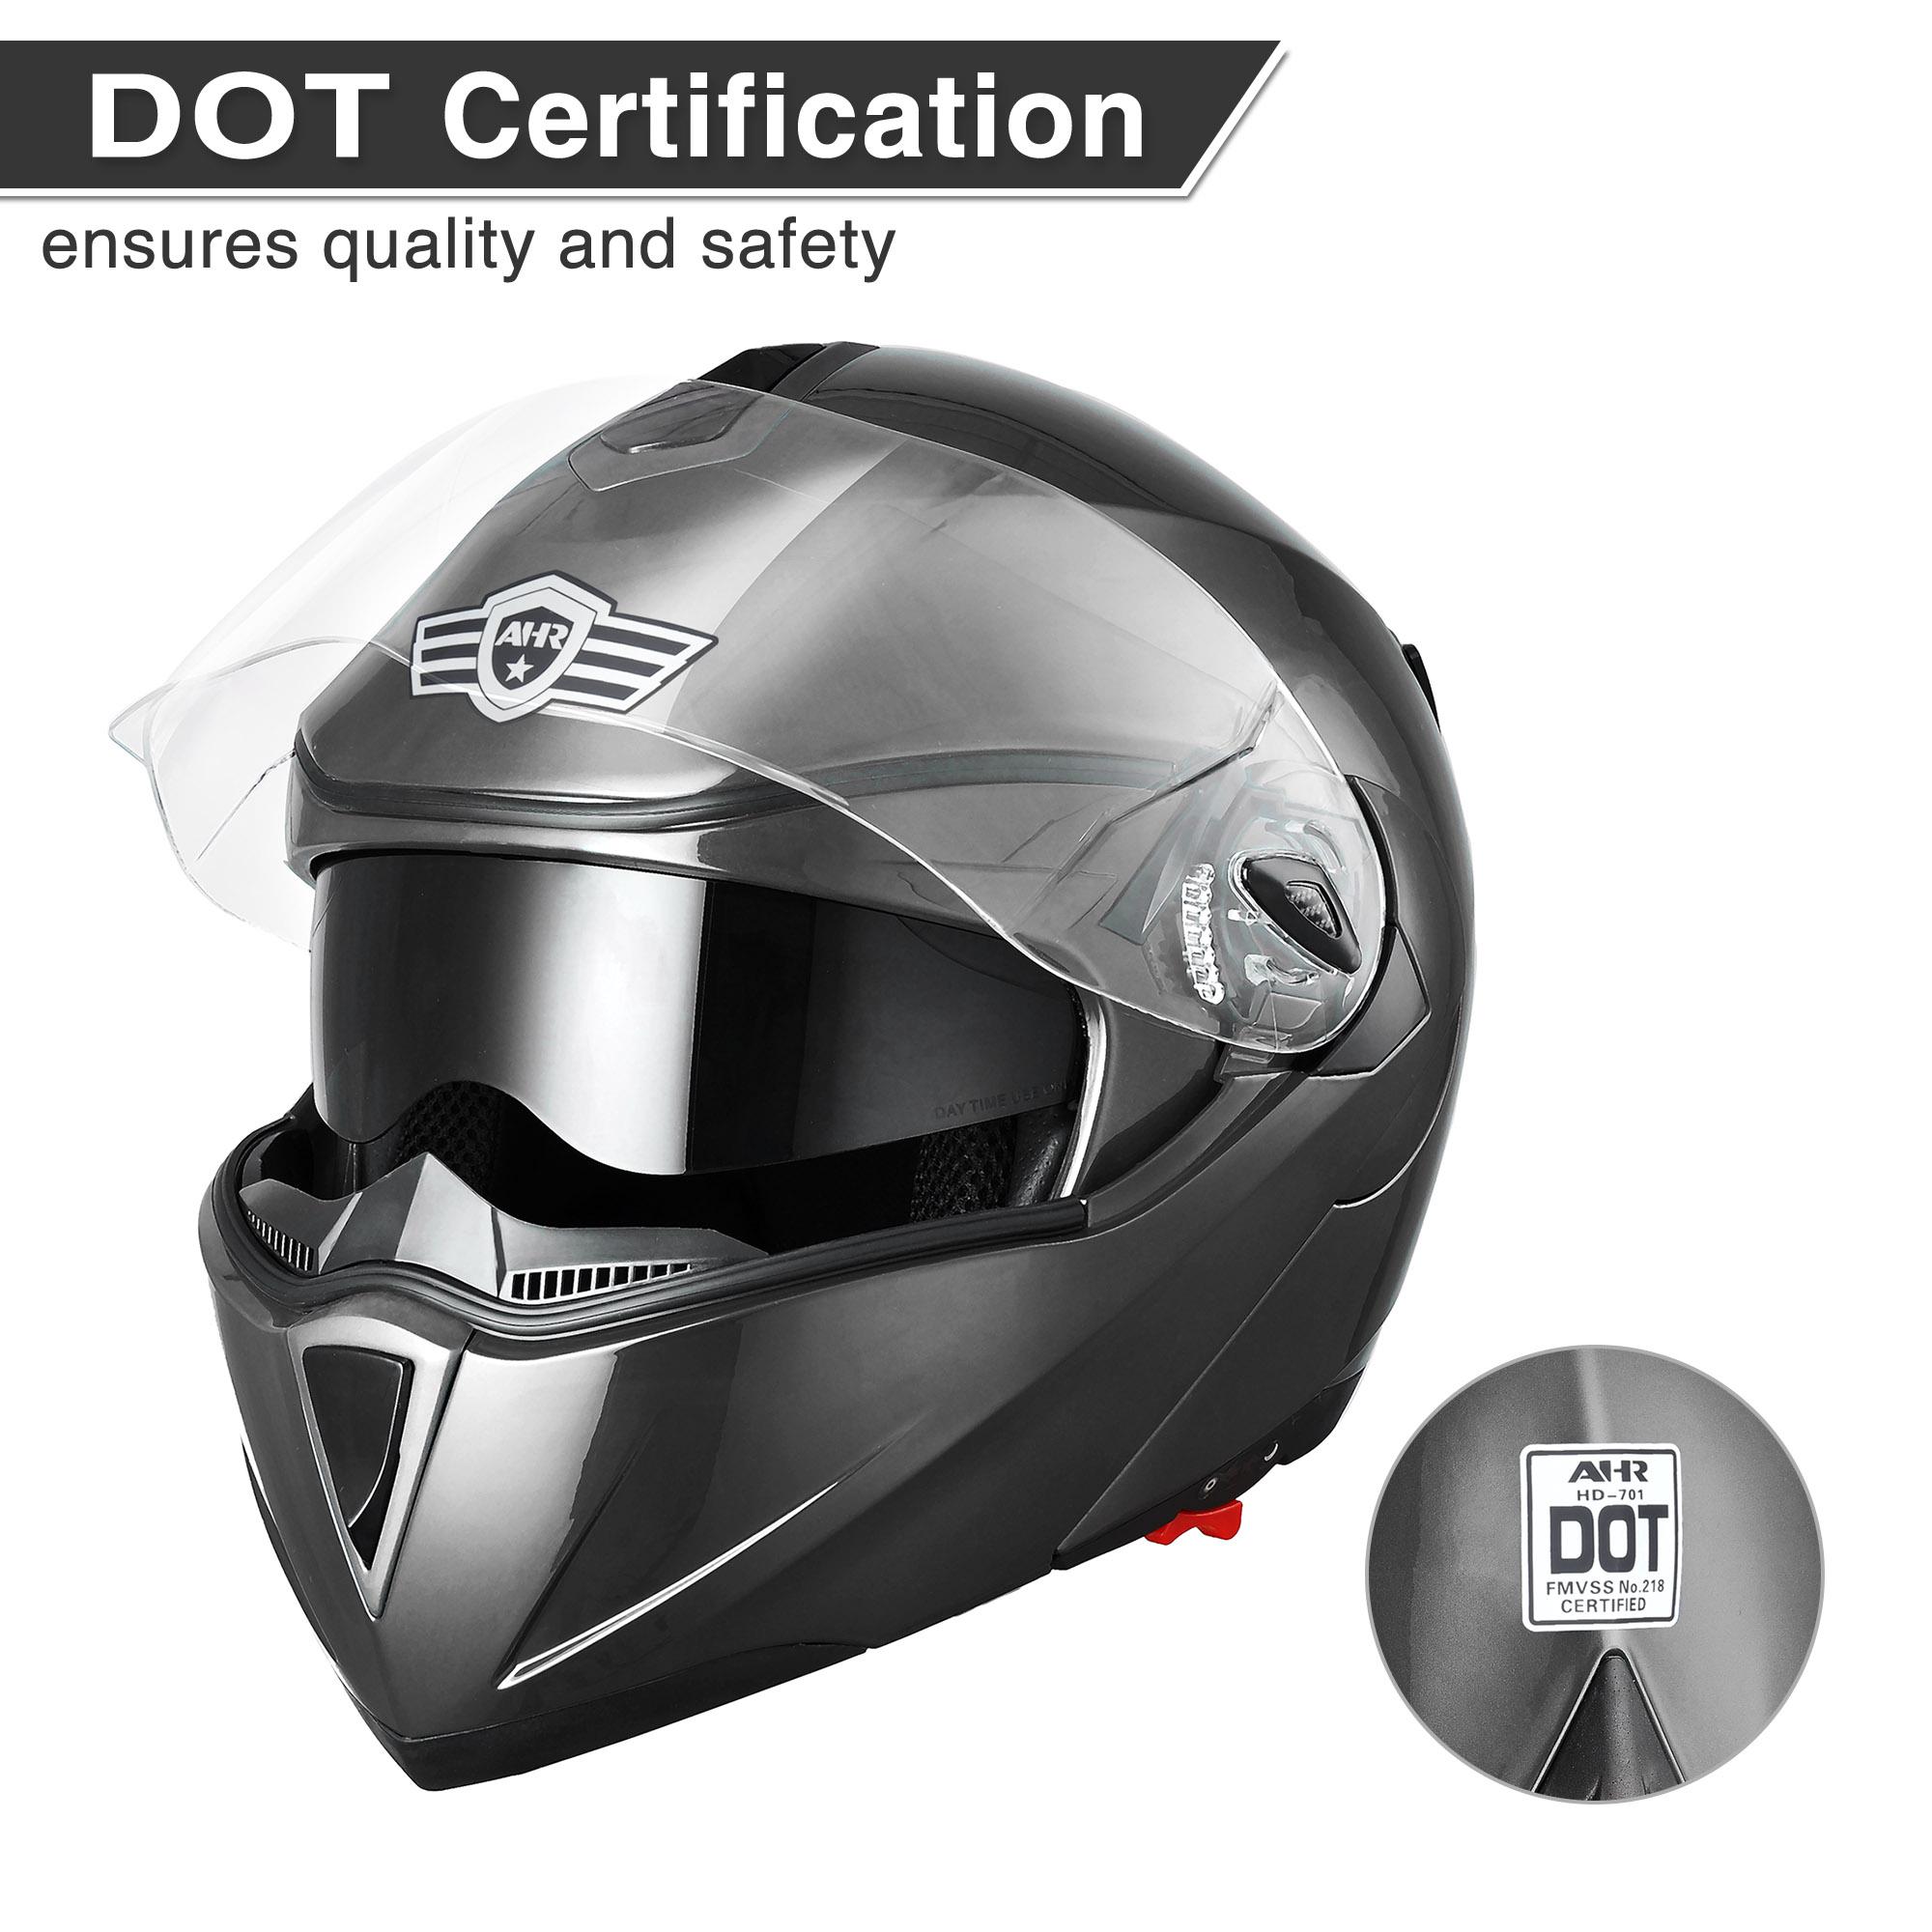 miniature 74 - DOT Flip up Modular Full Face Motorcycle Helmet Dual Visor Motocross Size Opt